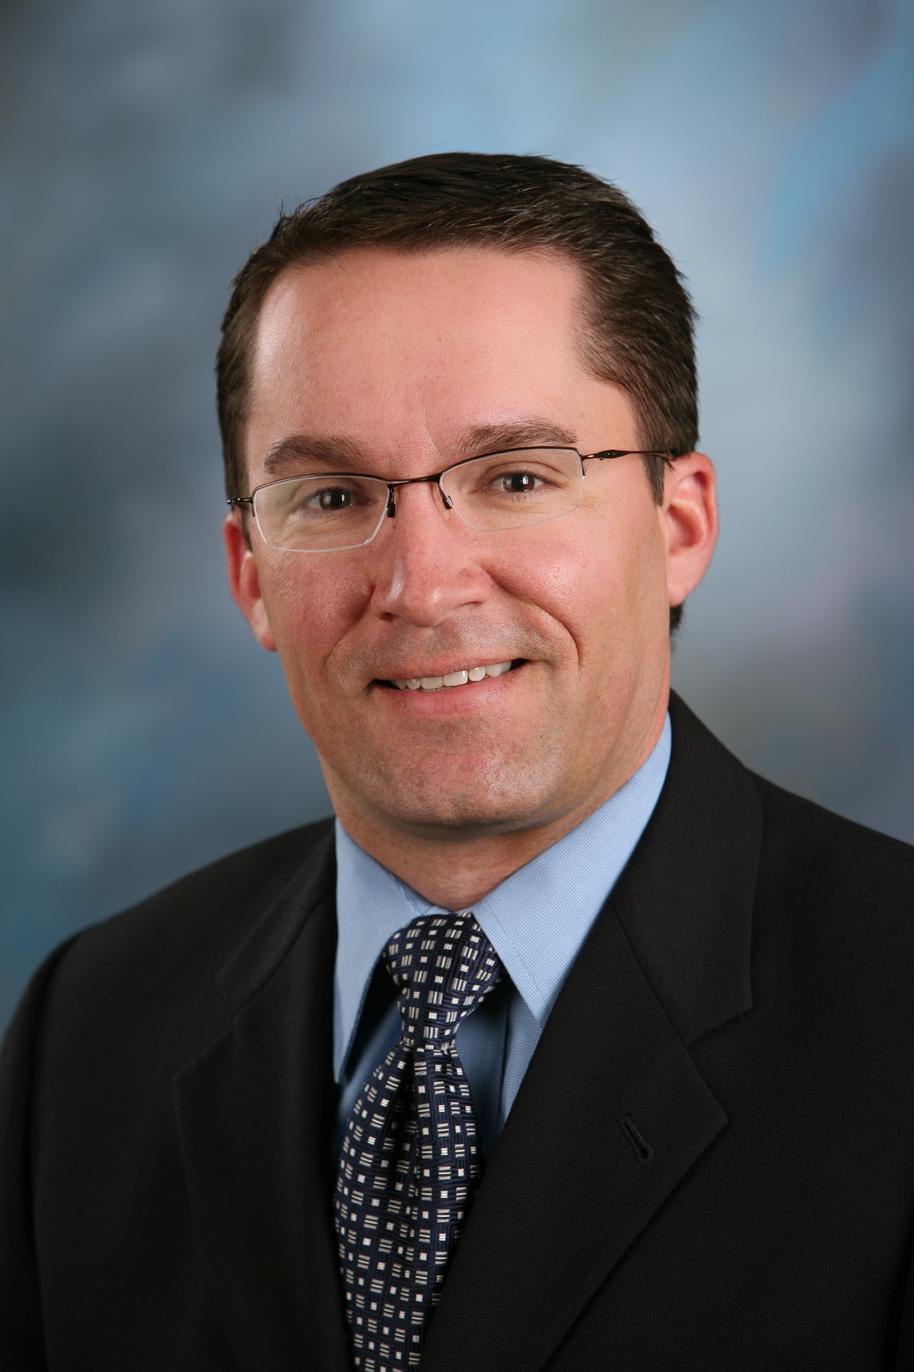 Gregg McKenzie